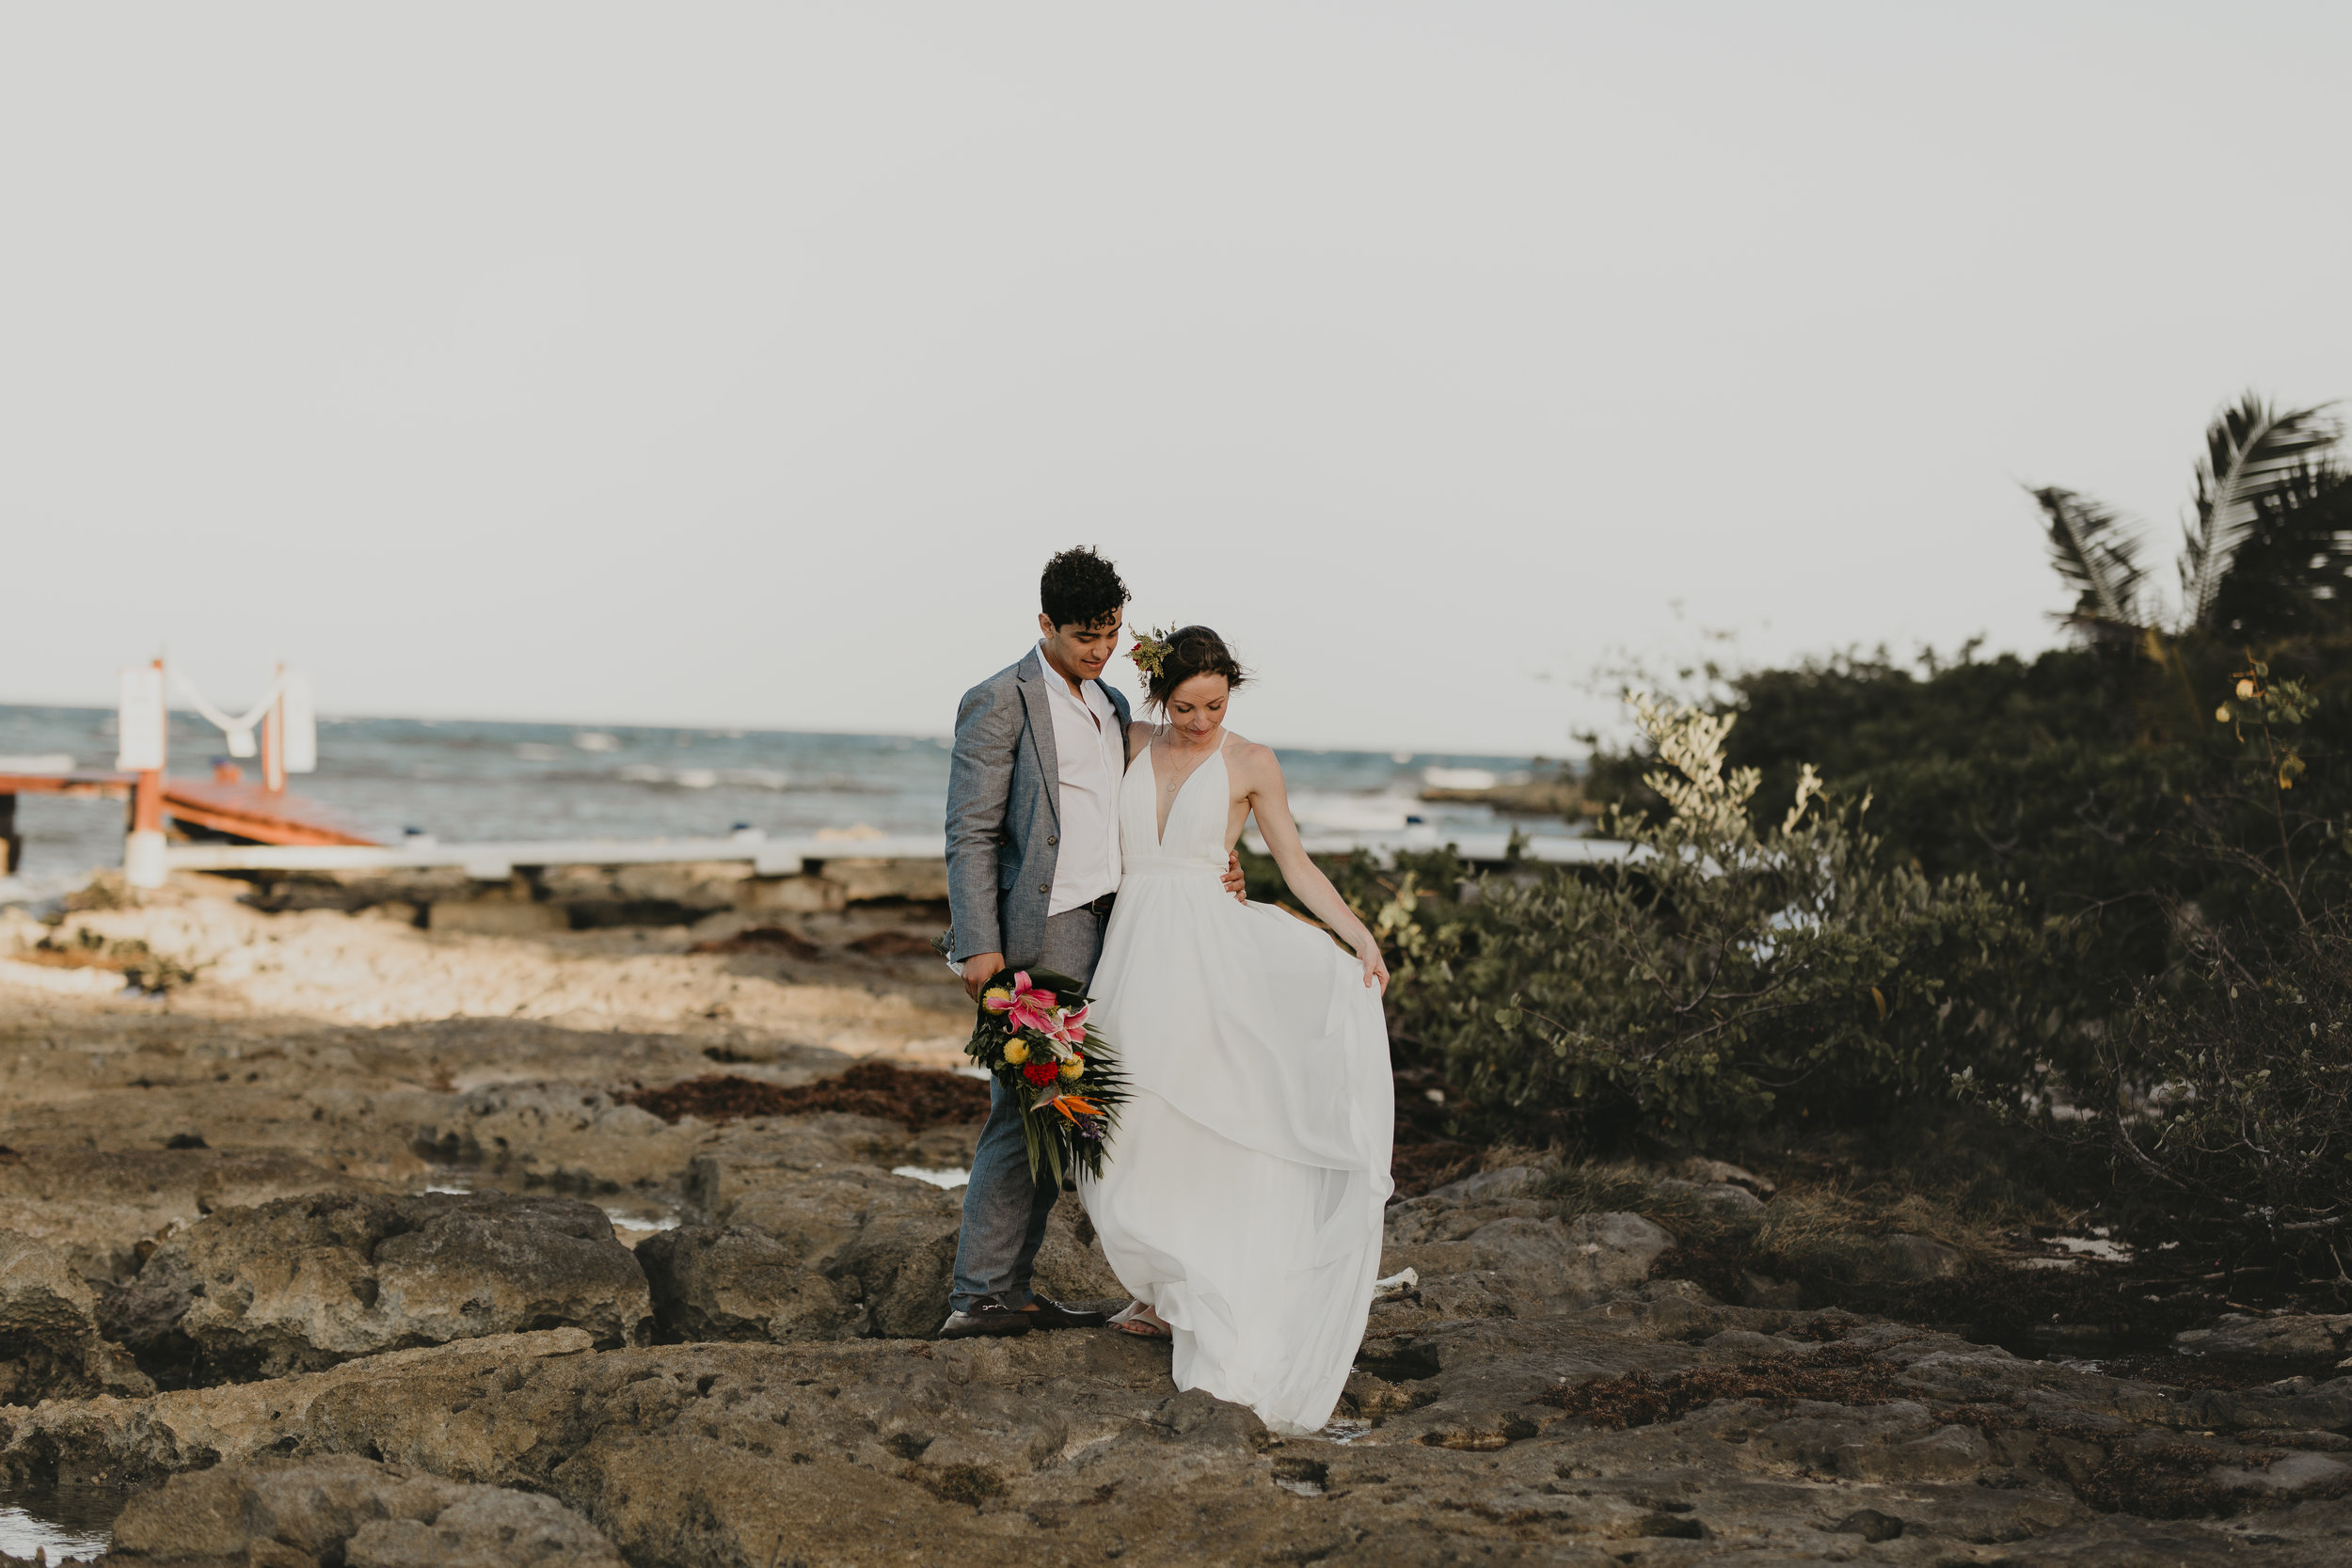 Nicole-Daacke-Photography-beachfront-akumal-destination-wedding-tulum-mexico-elopement-photographer-destination-wedding-inspiration-sunset-champagne-pop-boho-bride-ocean-tropical-bohemian-tulum-wedding-0830.jpg